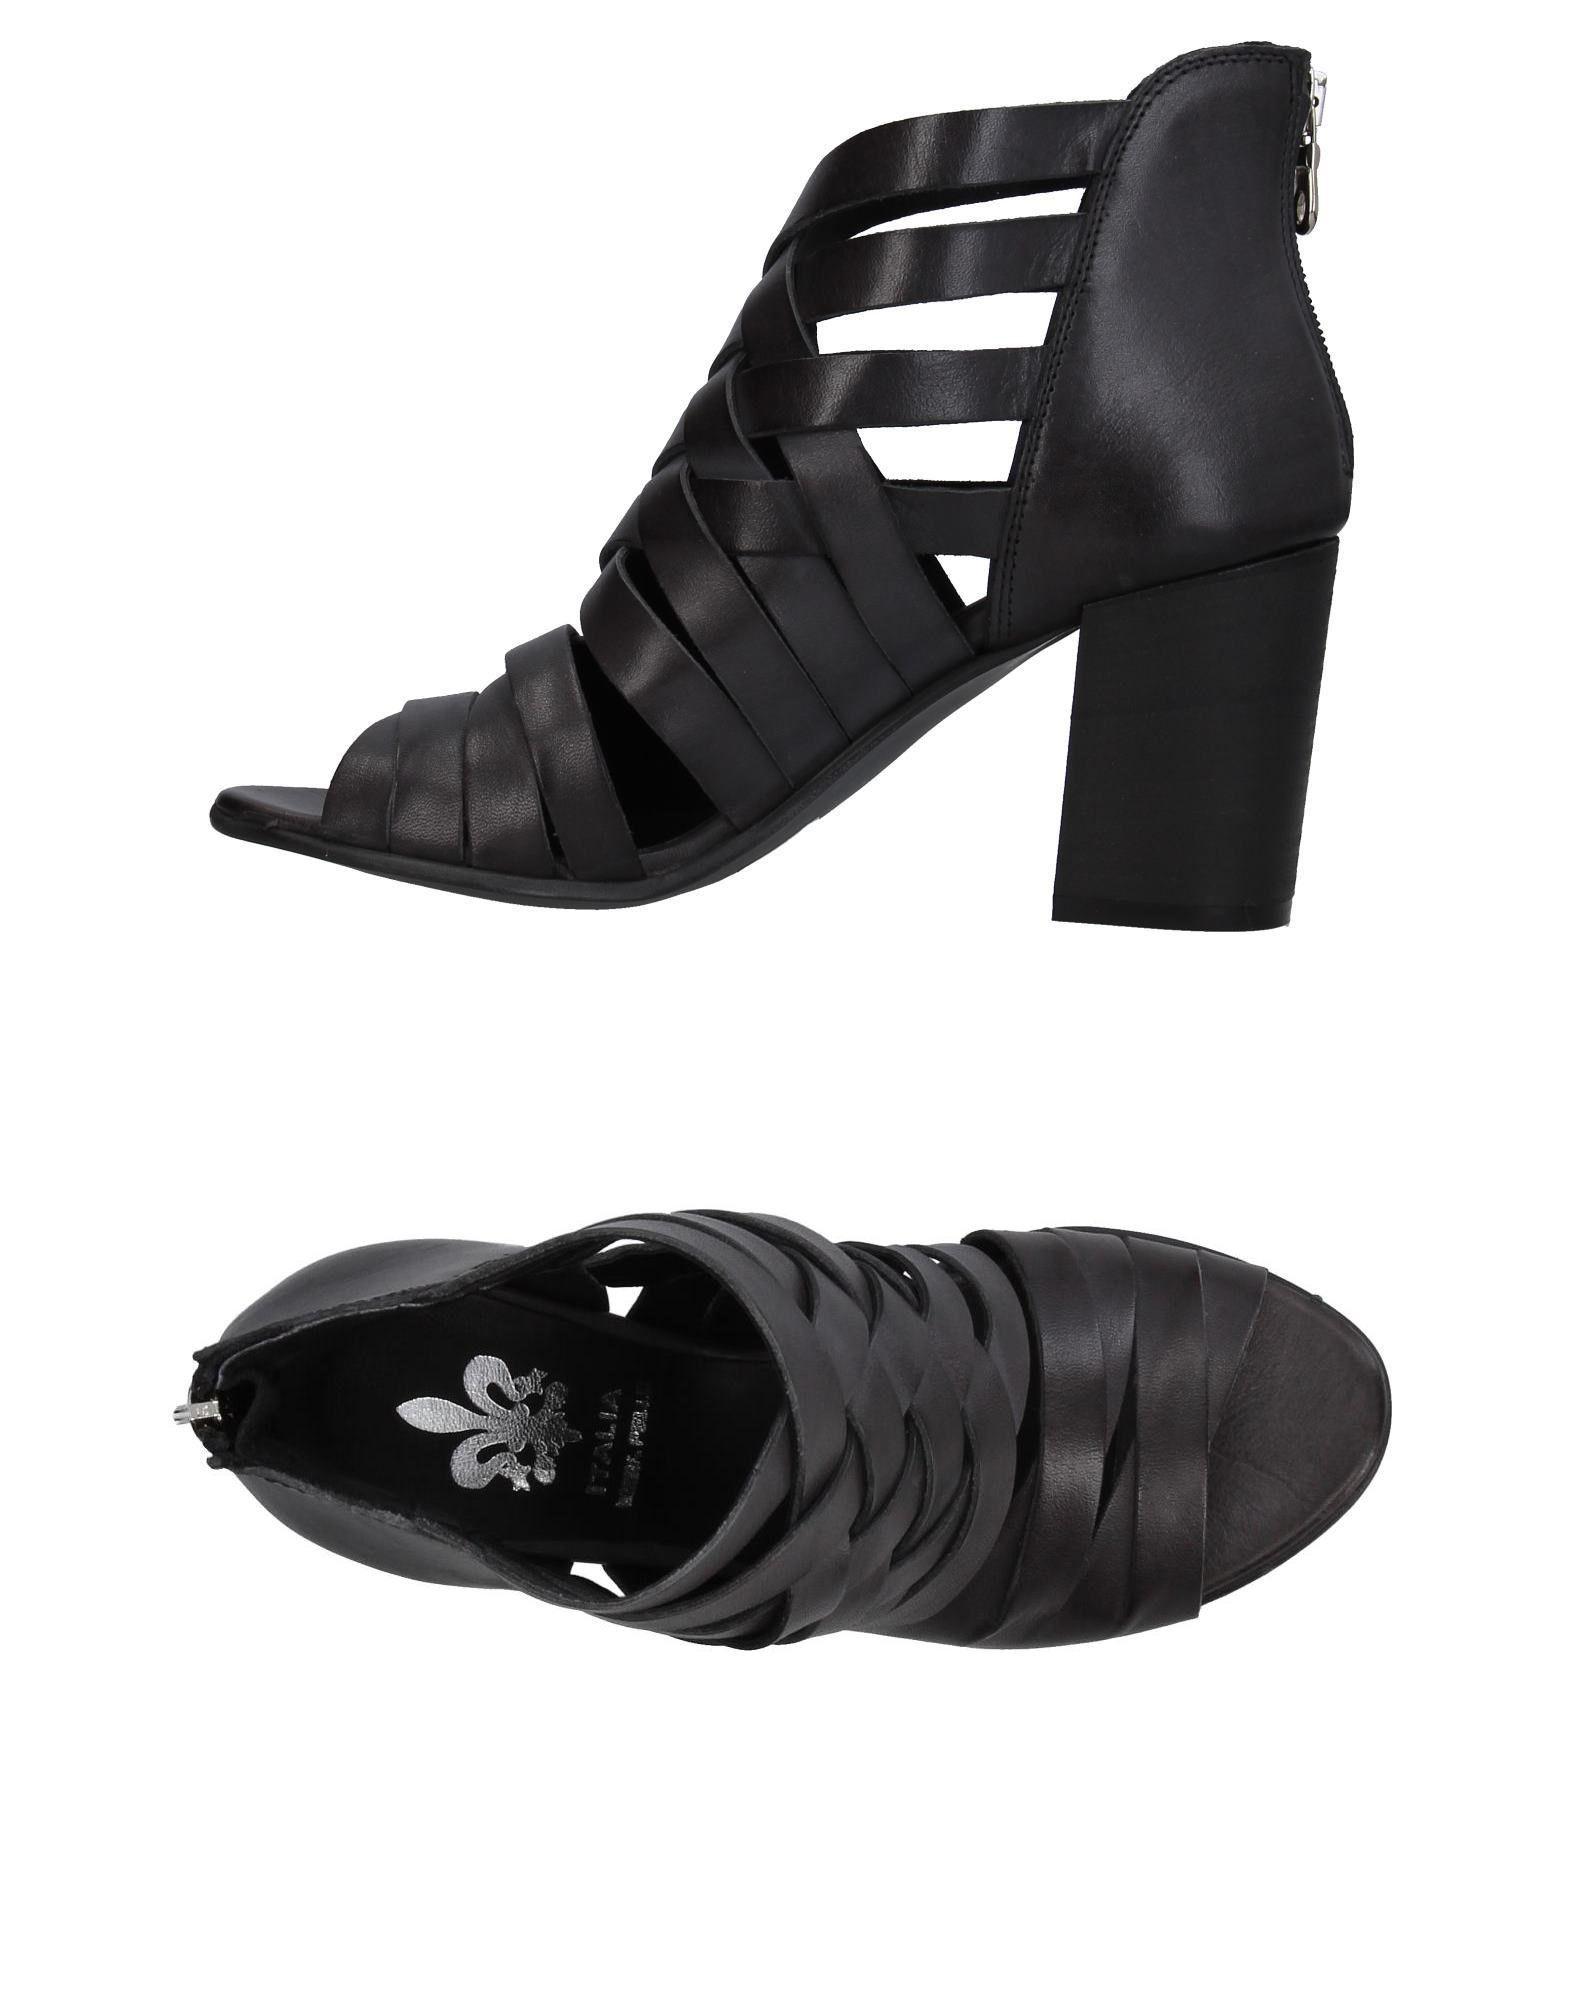 Gaia Shoes Sandalen Damen  11403550UB Gute Qualität beliebte Schuhe